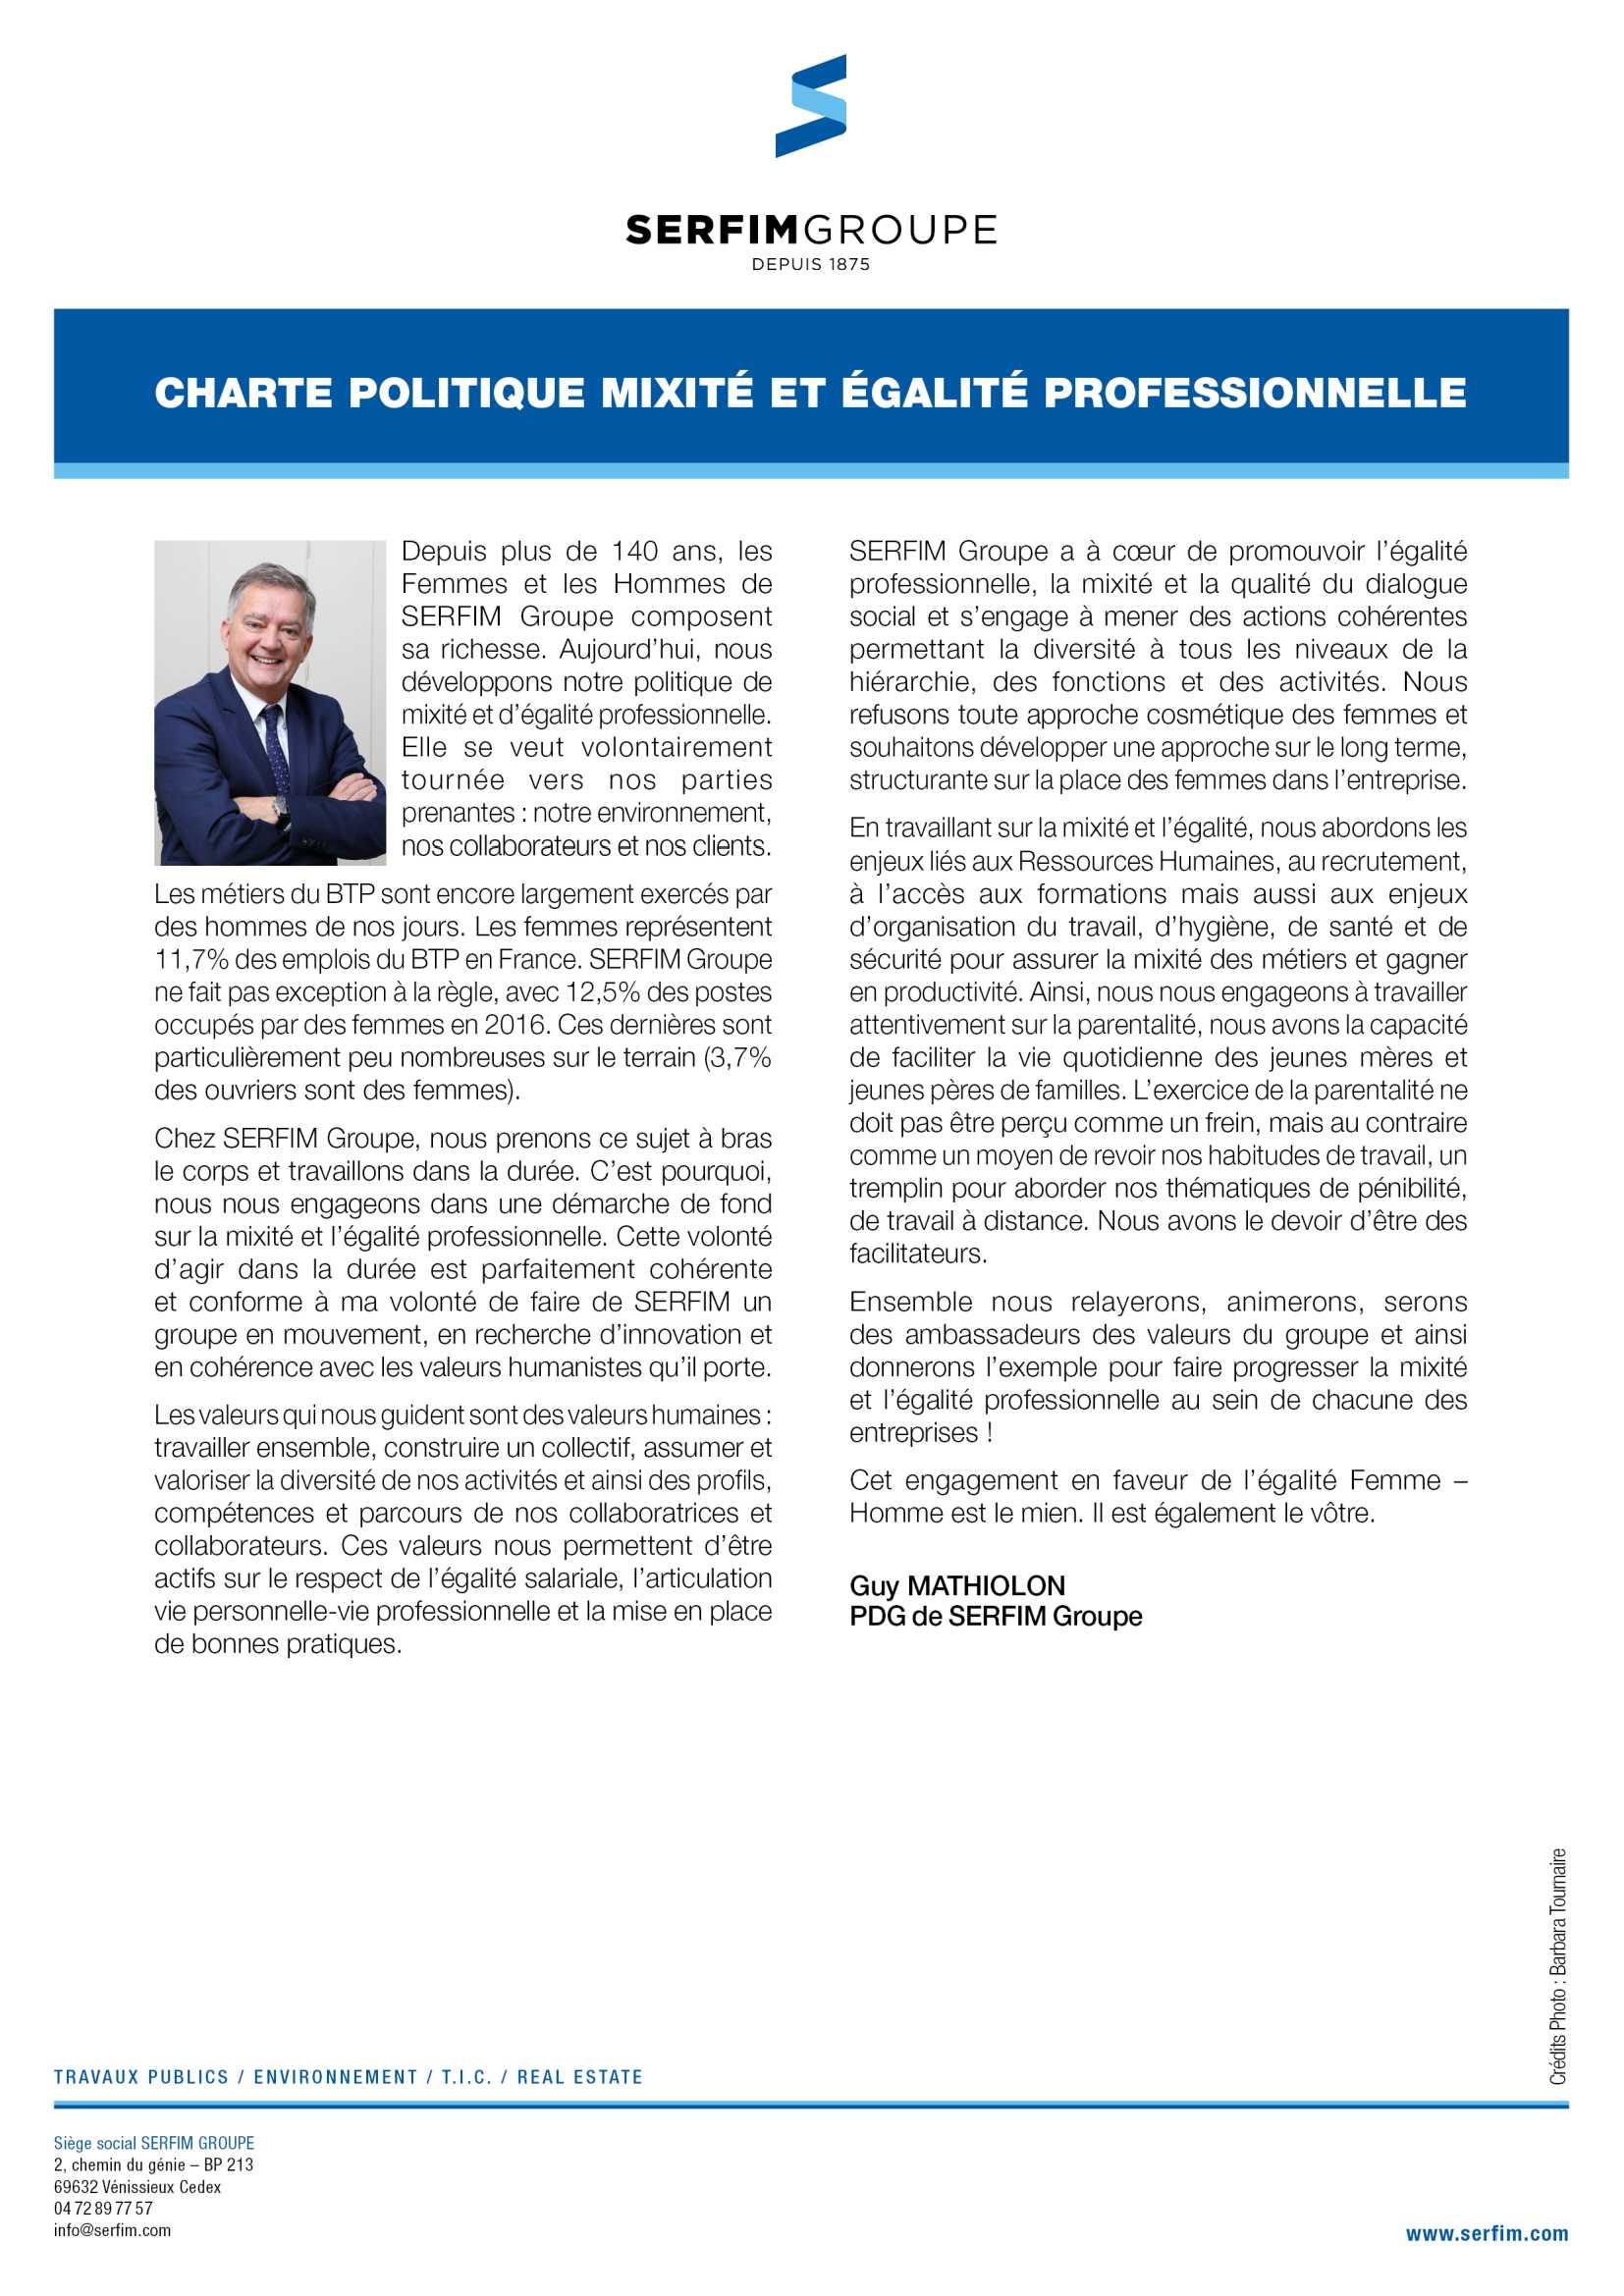 charte-mixite-egalite-professionnelle-serfim-groupe